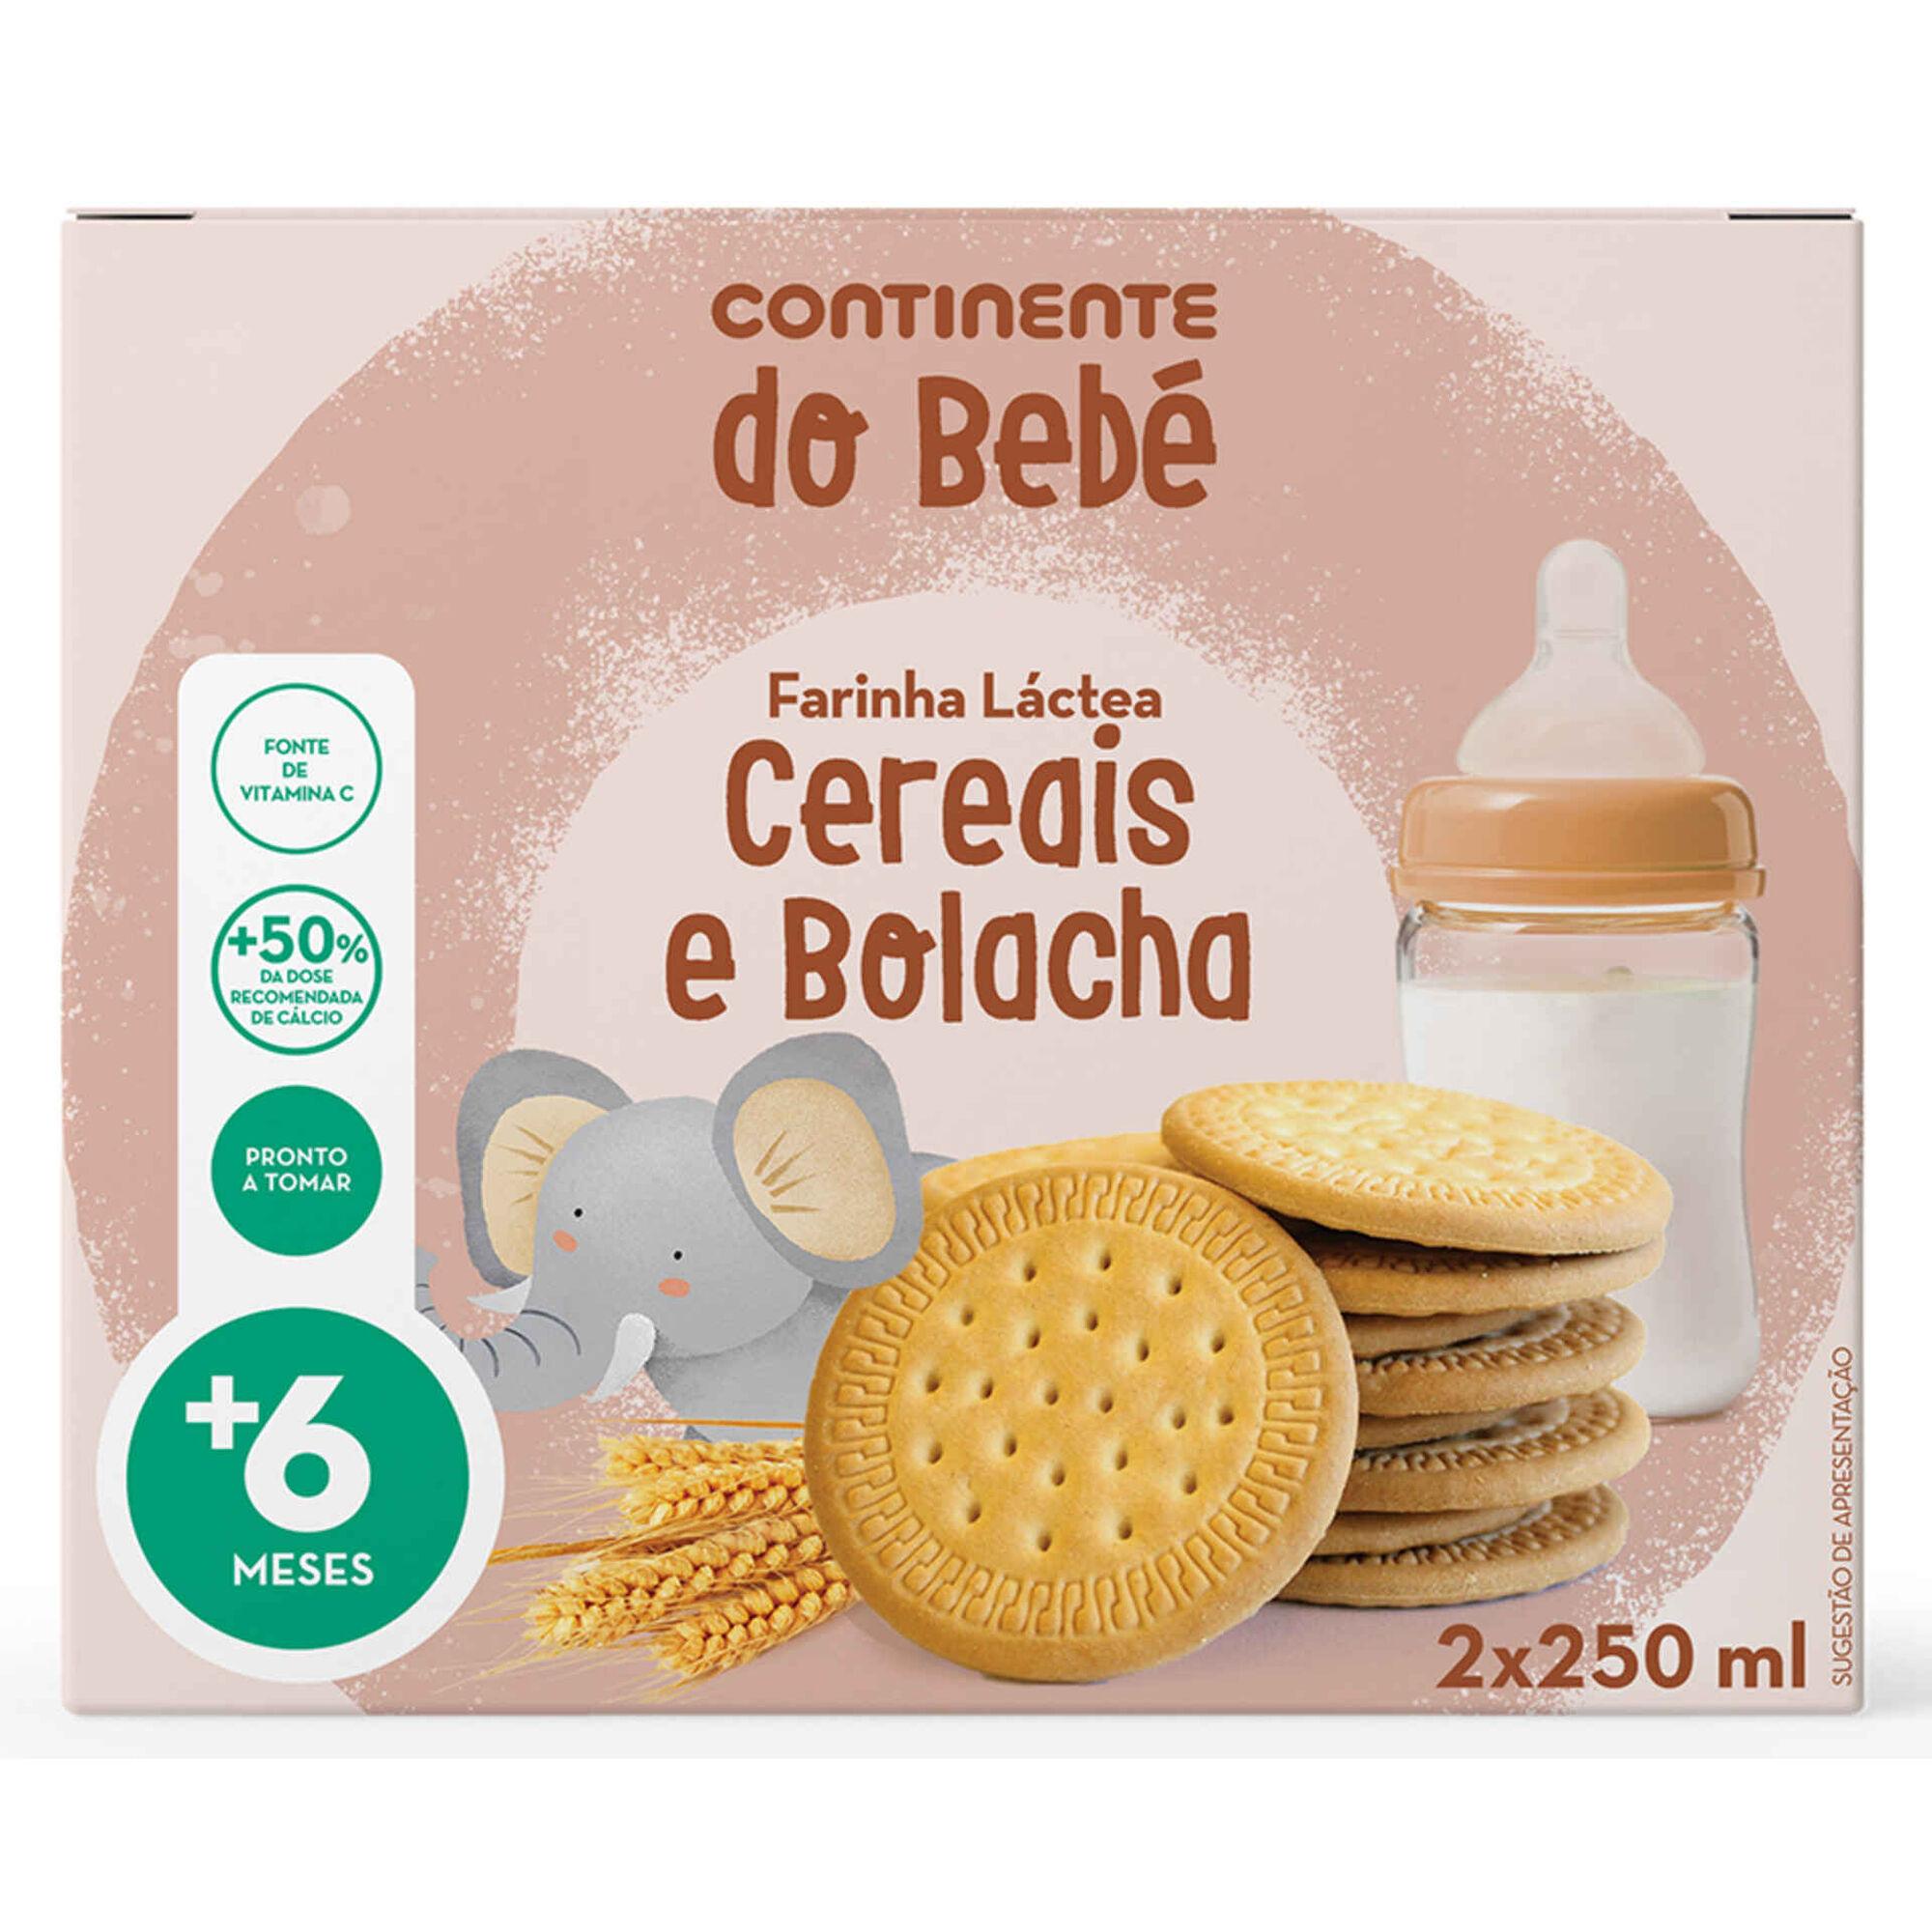 Papa Infantil Farinha Láctea Cereais e Bolacha +6 Meses